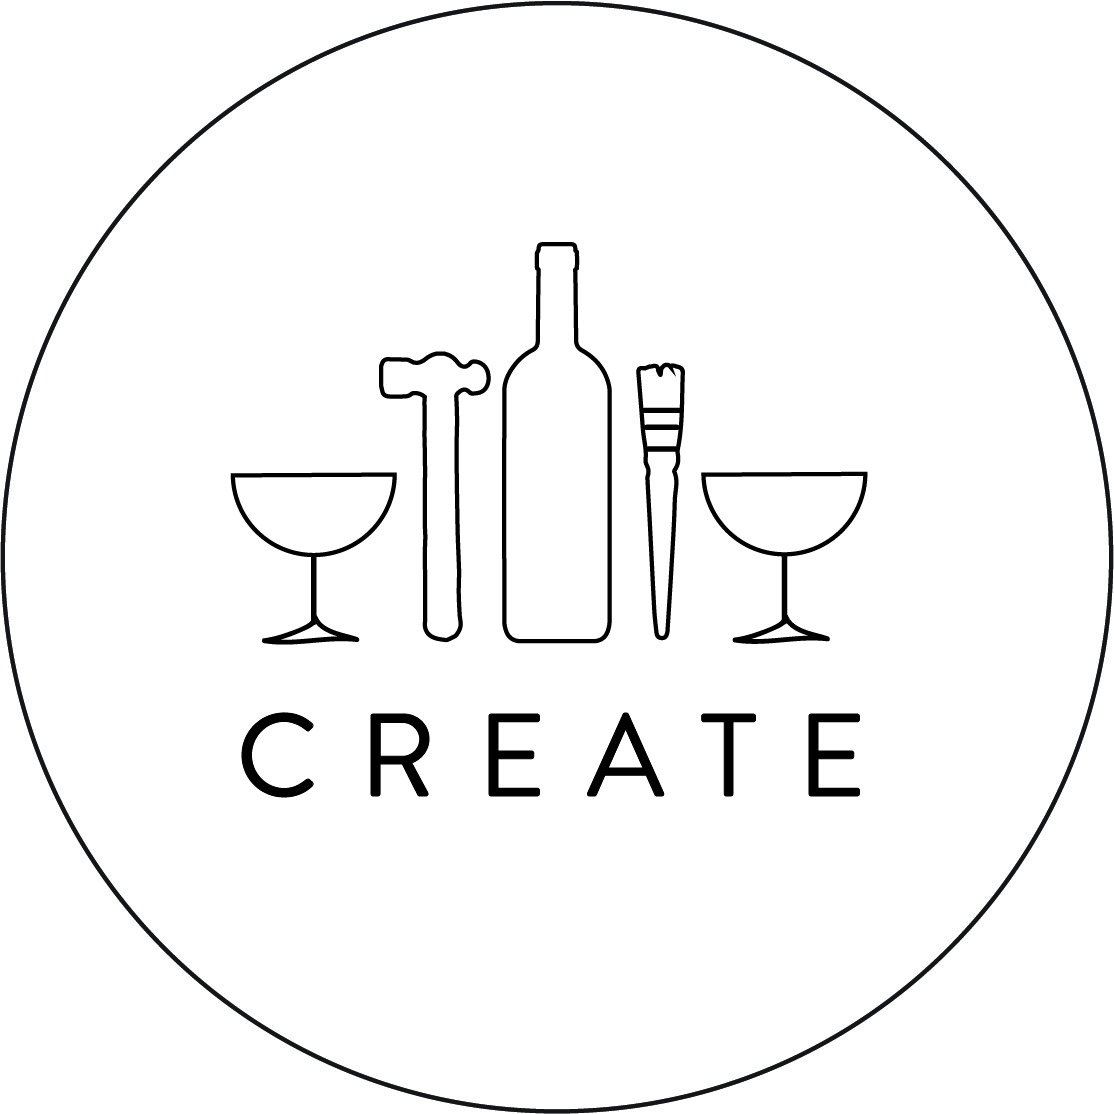 create+small+cirlce+logo.jpg